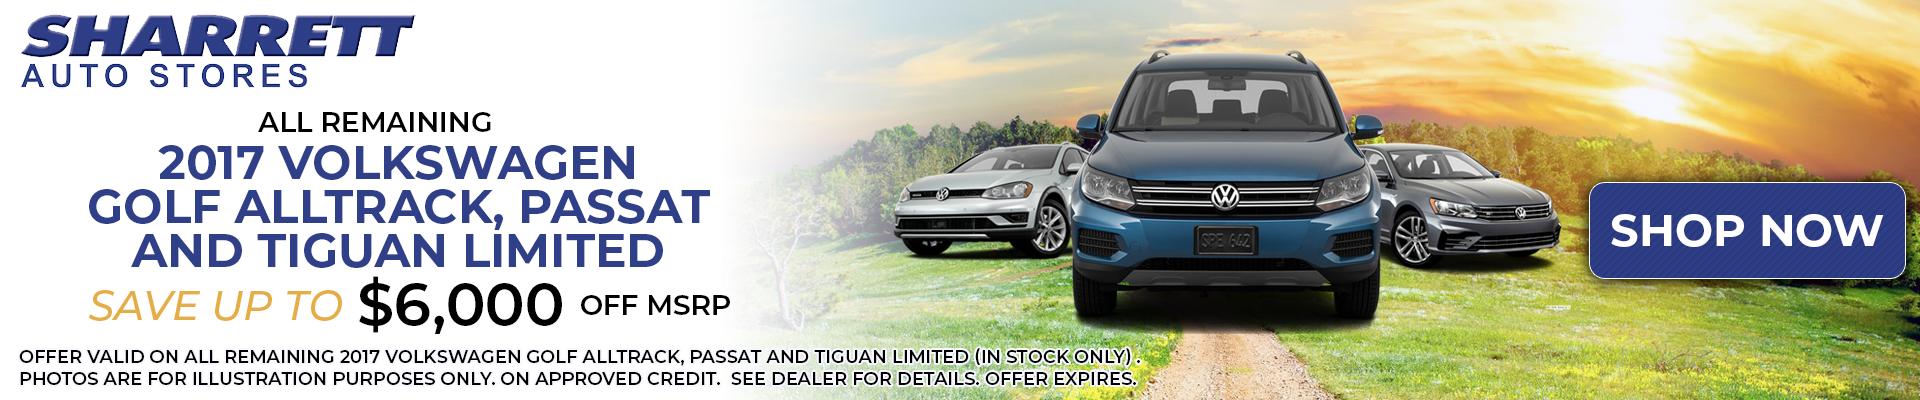 2017 Volkswagen Golf Alltrack, Passat and Tiguan Limited